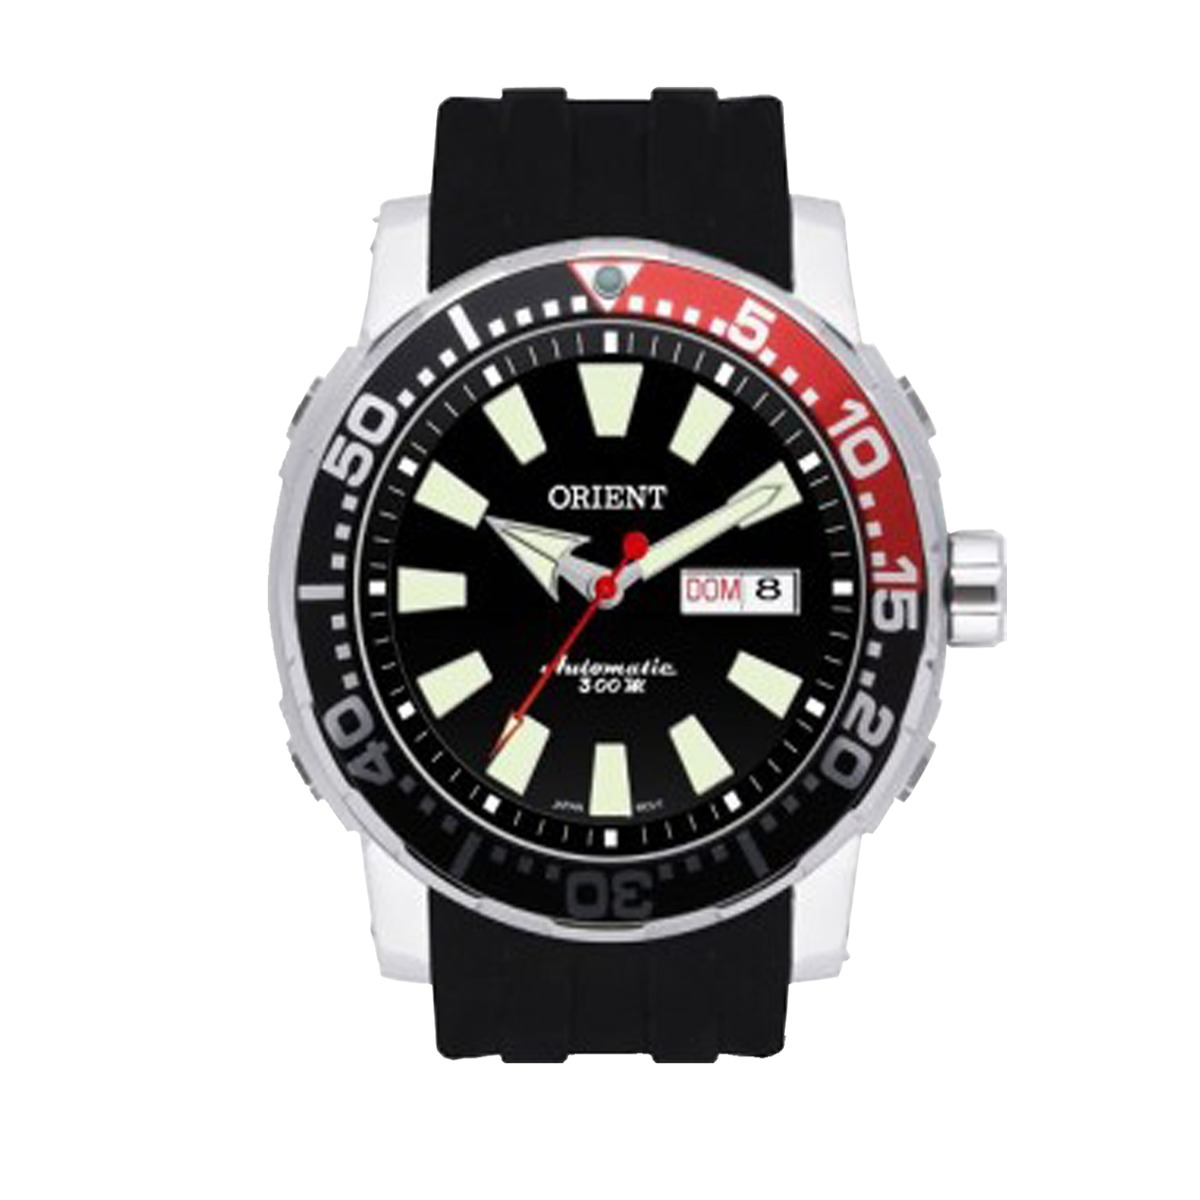 f2a788530c3 relógio orient original masculino scuba diver 469ss039 pvsx. Carregando  zoom.